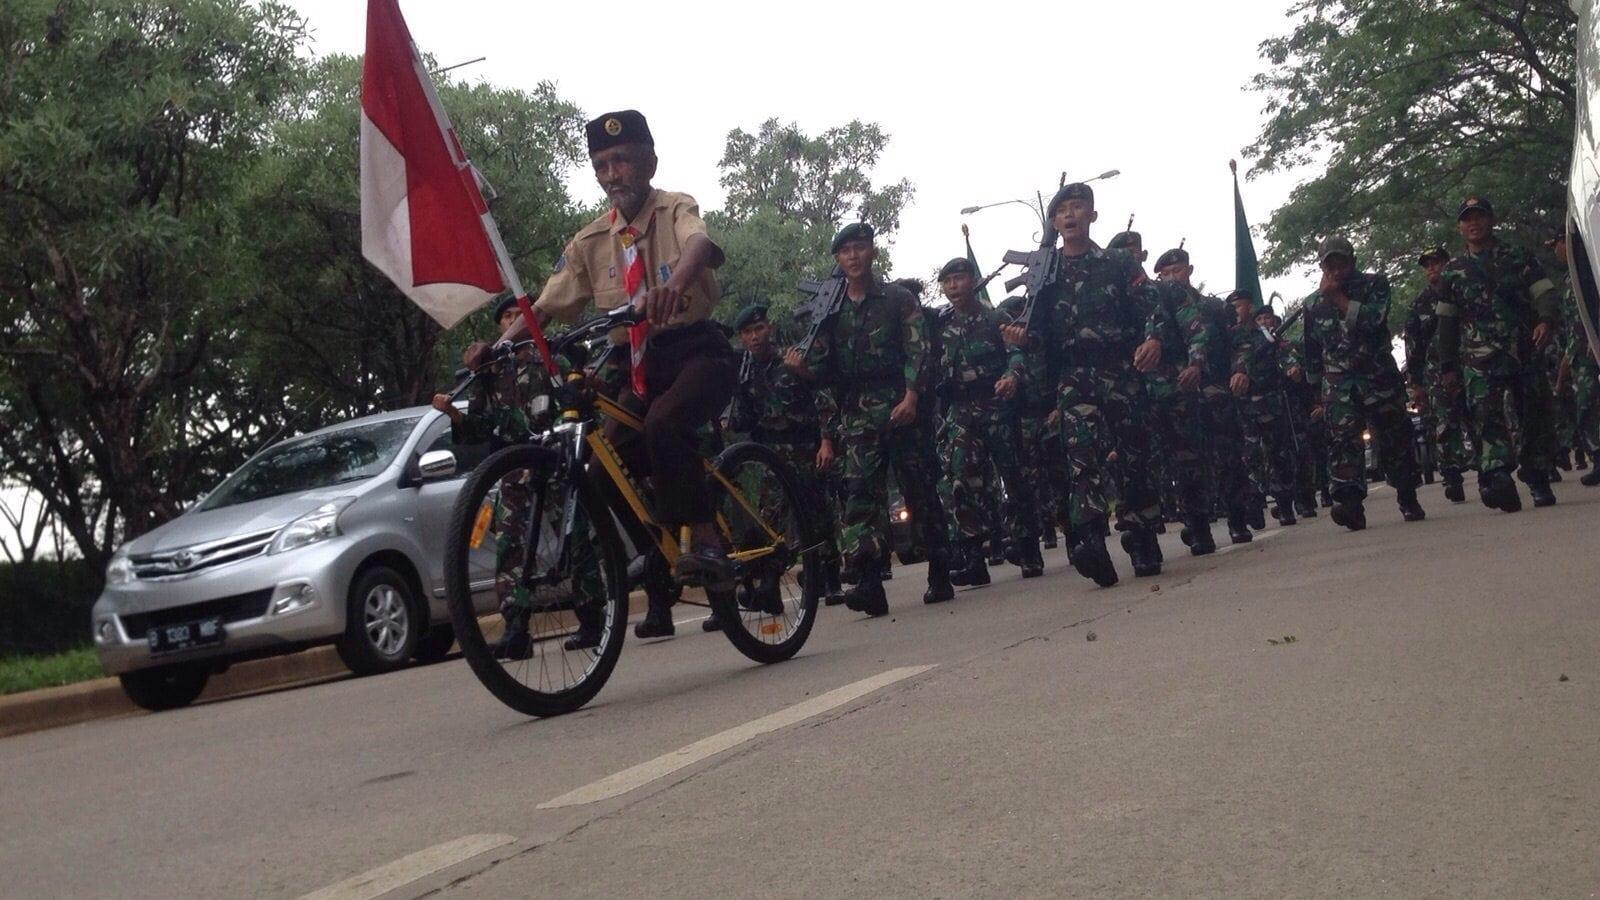 Prajurit Infanteri Kodam Jaya lewati Hari ke-3 YWPJ Dengan Sukacita Bersama Masyarakat